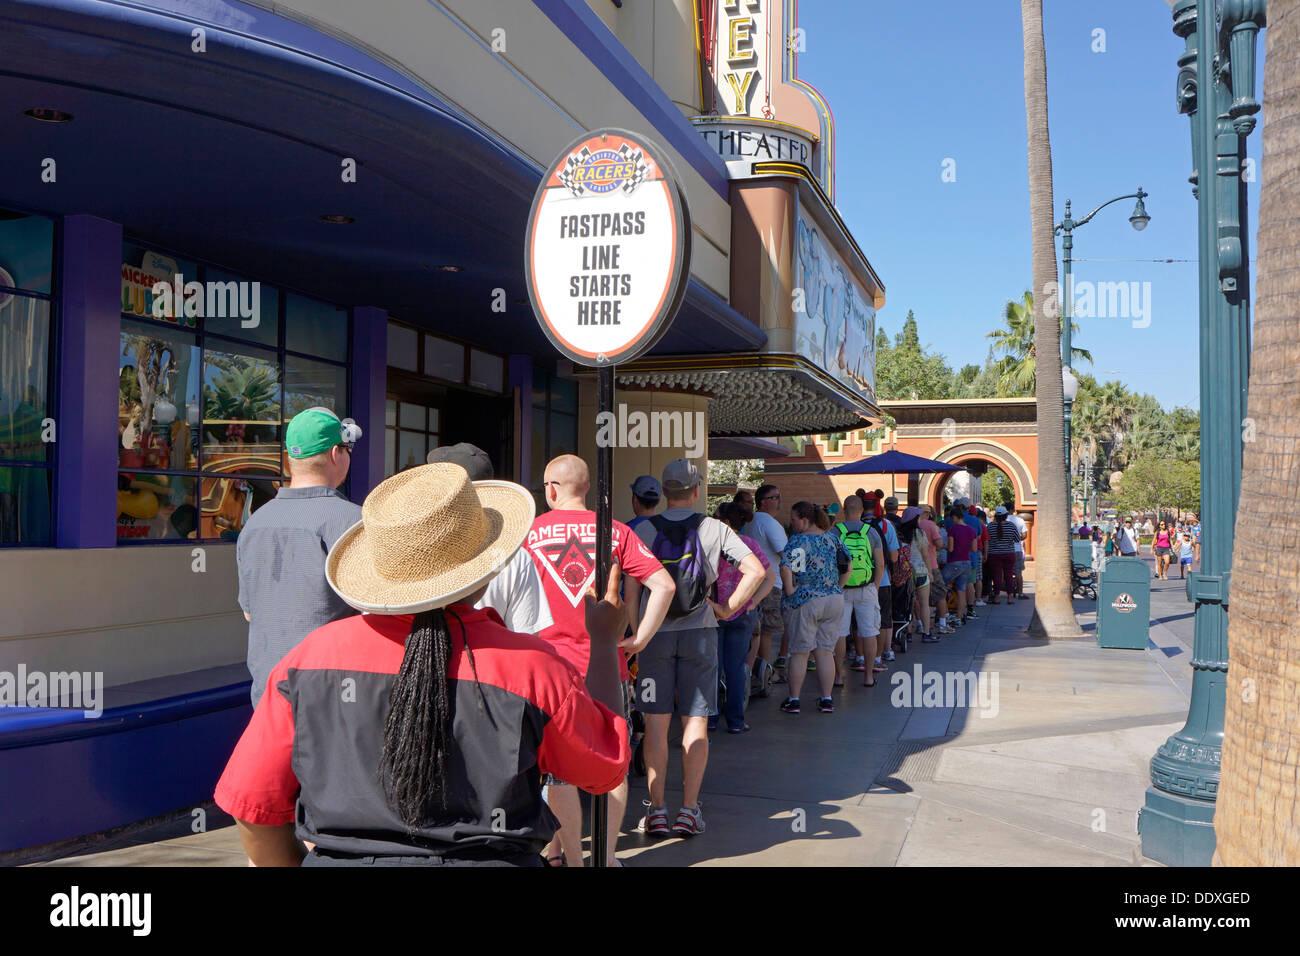 Disneyland, File d Fastpass, Service, Ligne, California Adventure Park, Anaheim Photo Stock